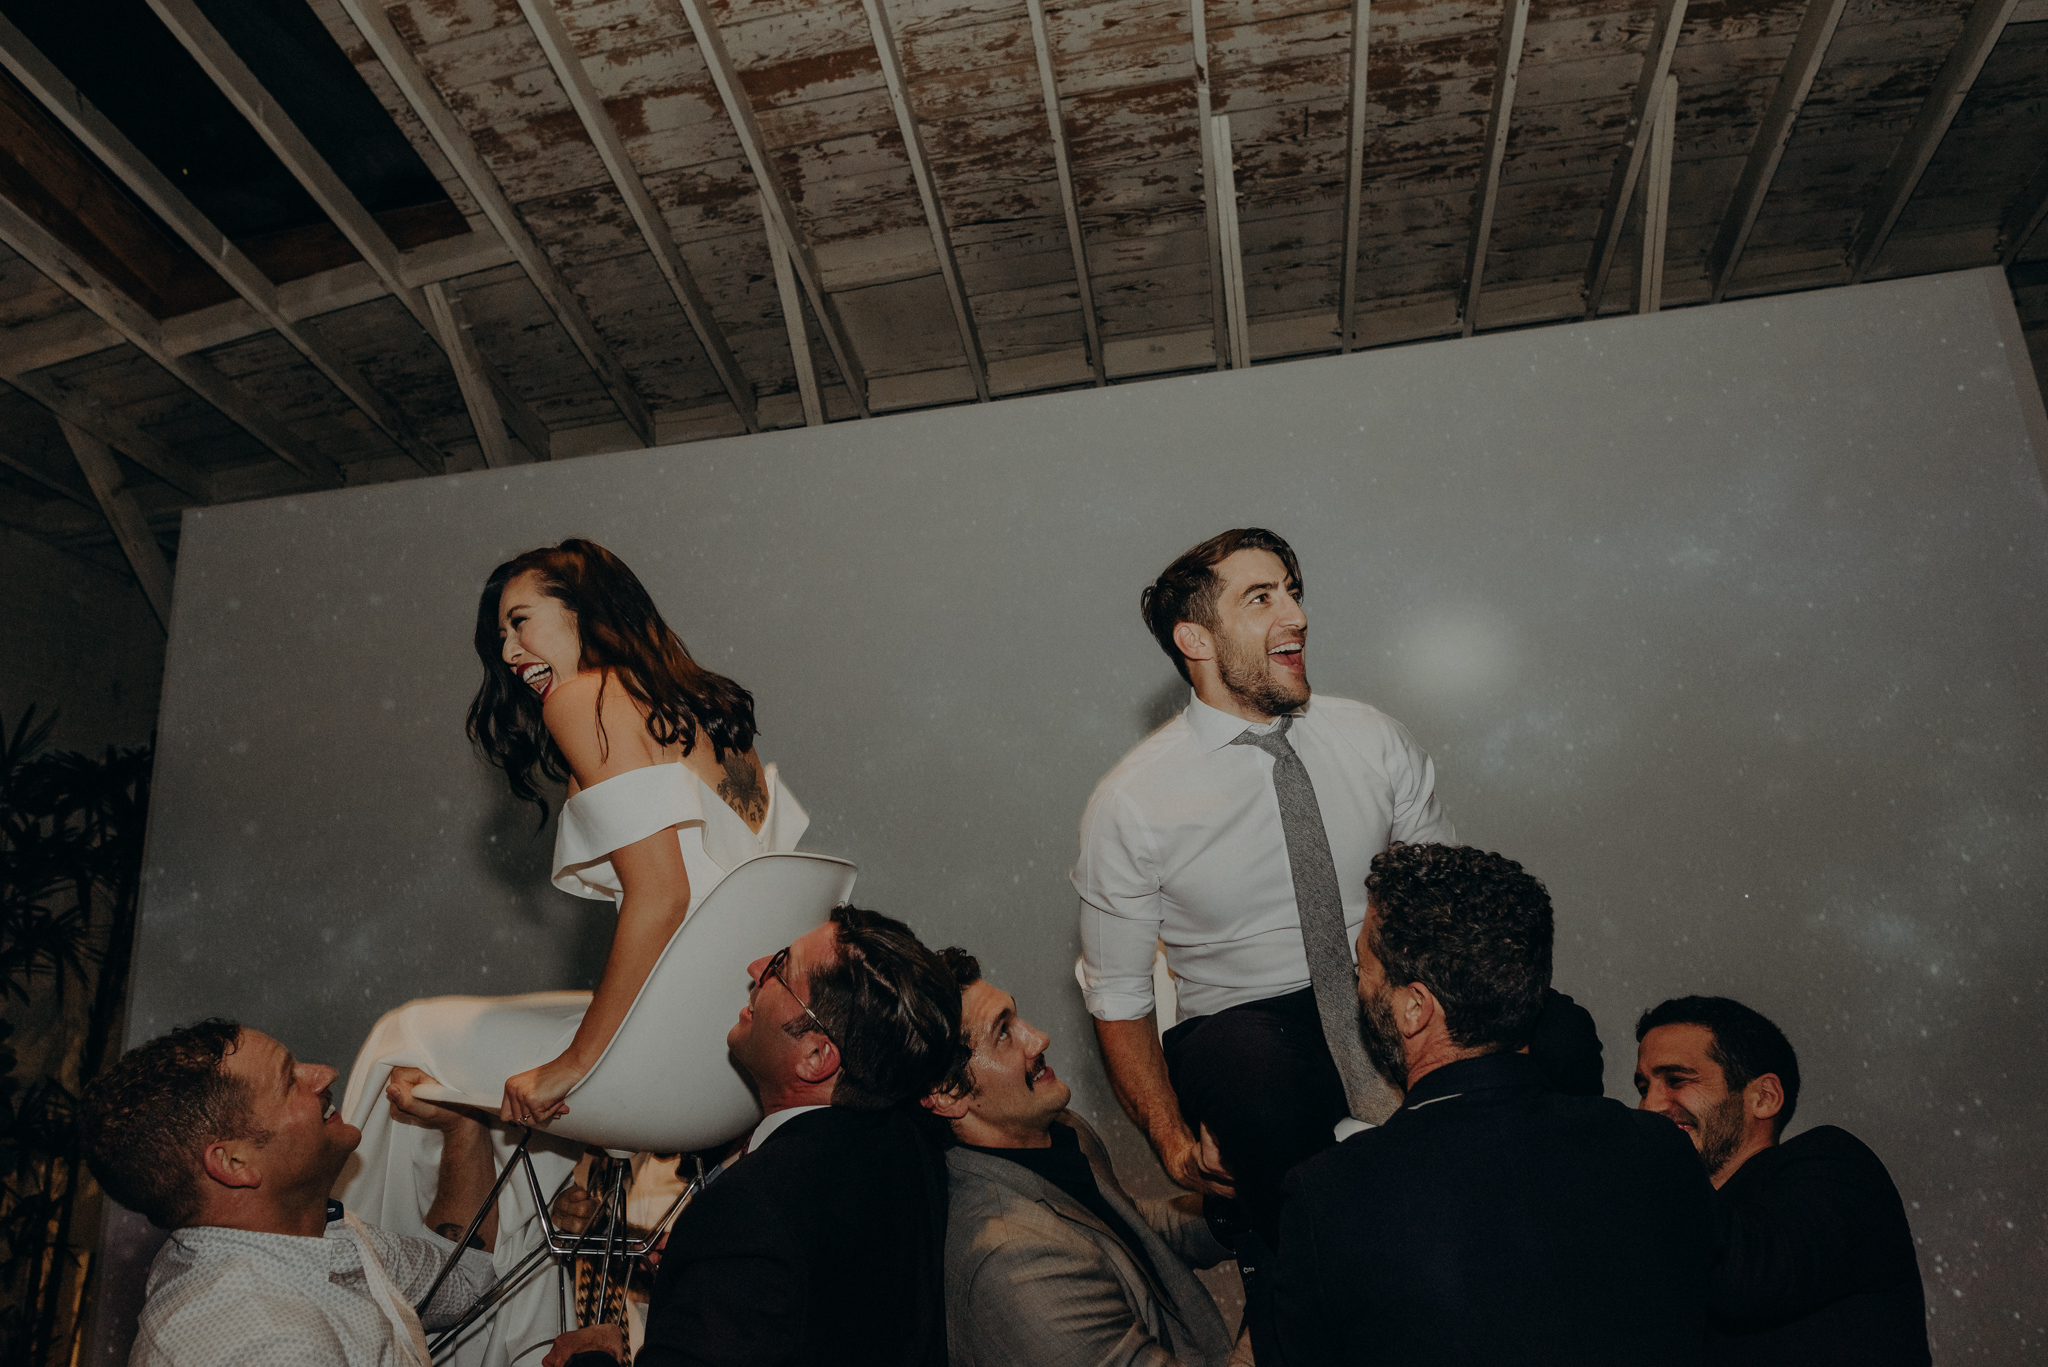 Wedding Photo LA - wedding photographer in los angeles - millwick wedding venue -isaiahandtaylor.com-148.jpg